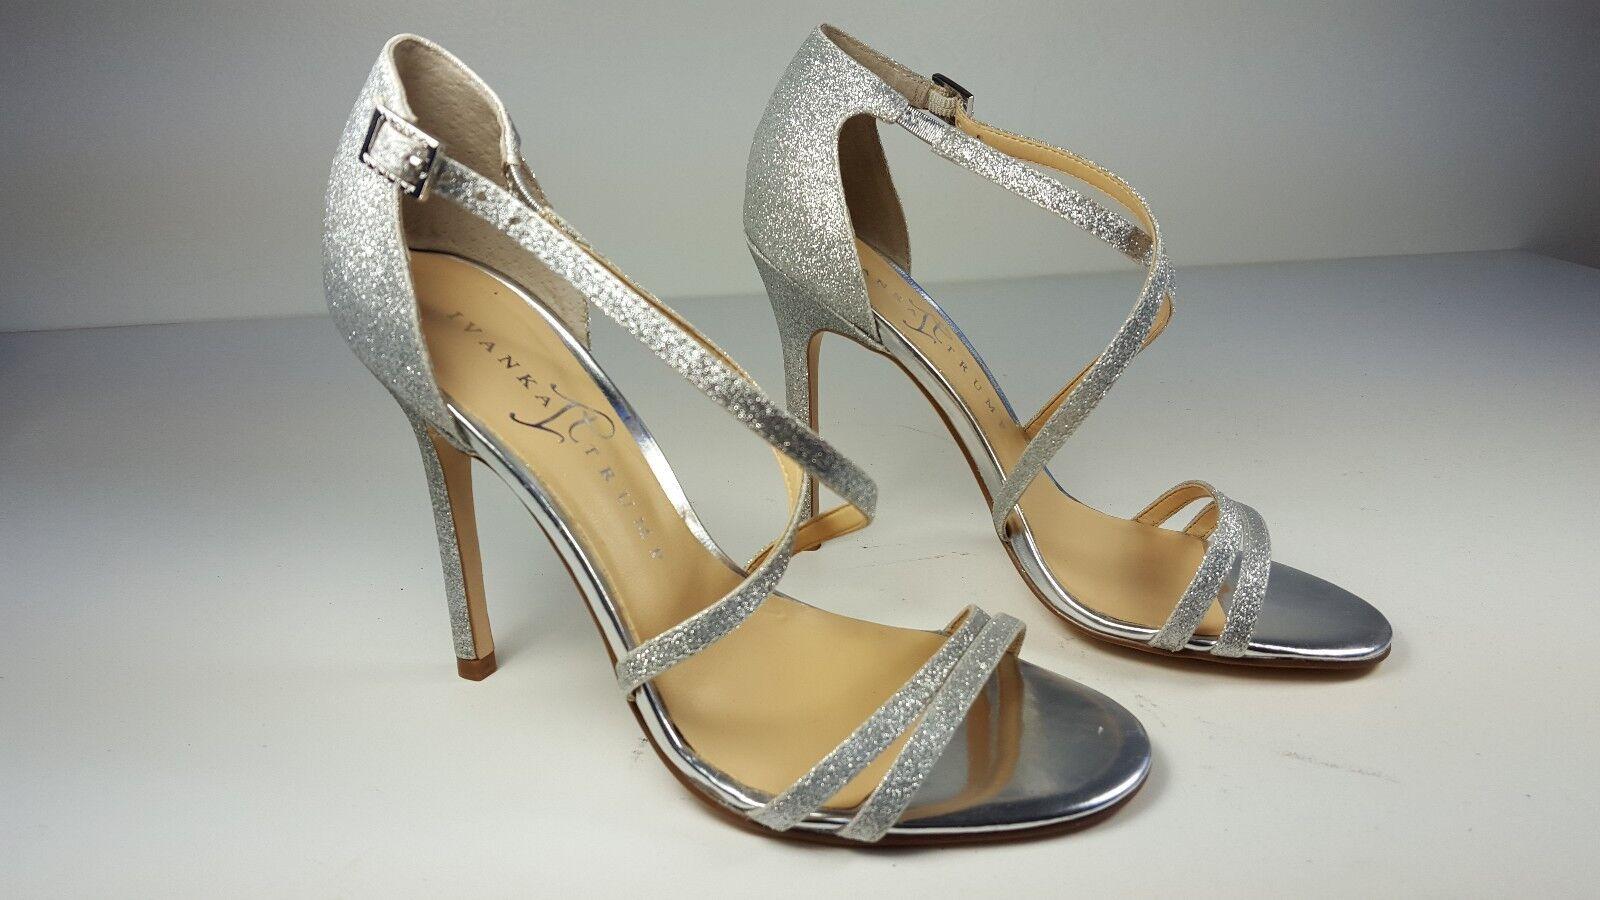 130 size 6 Ivanka Trump Duchess 2 Silver Strappy Open Toe Heels Sandals NEW